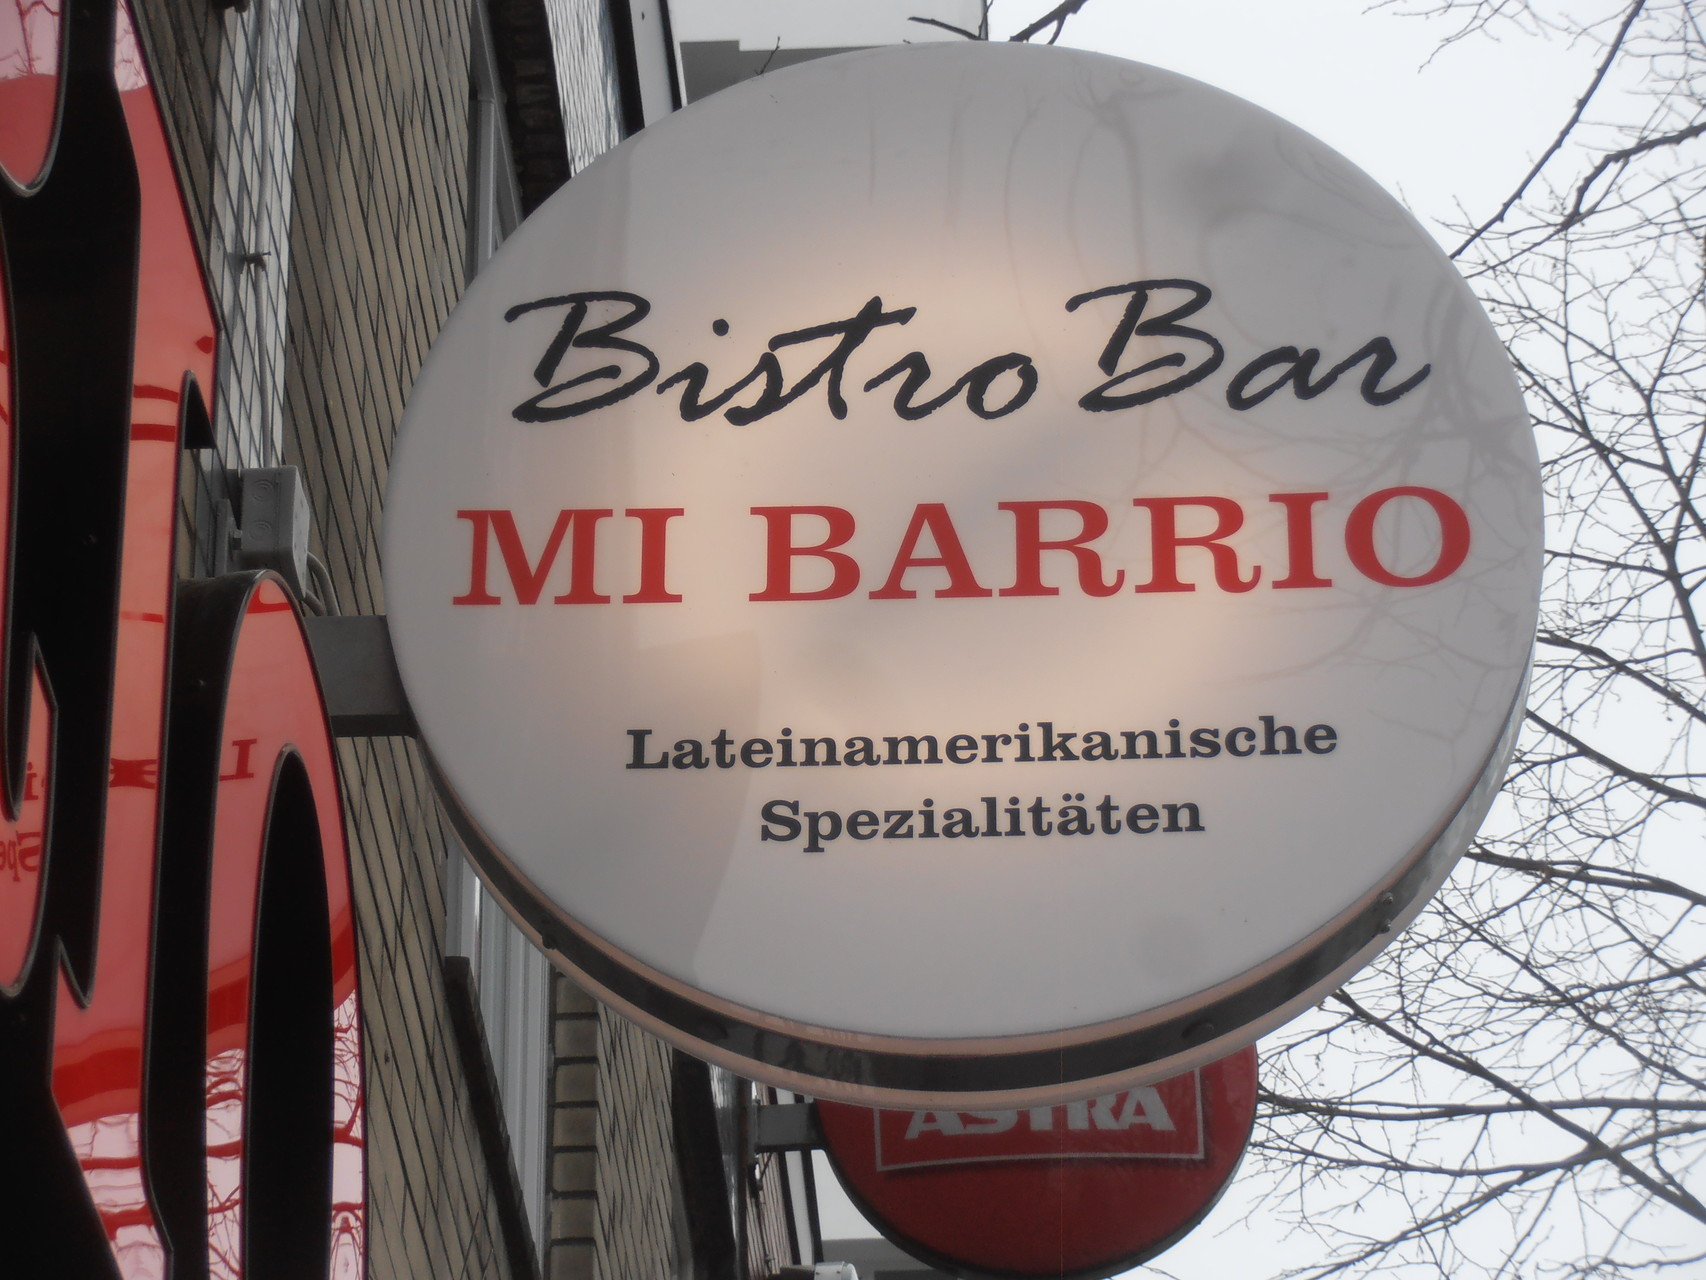 Bistro Bar - MI BARRIO - Lateinamerikanische Spezialitäten - Reeperbahn 153 Hamburg St. Pauli